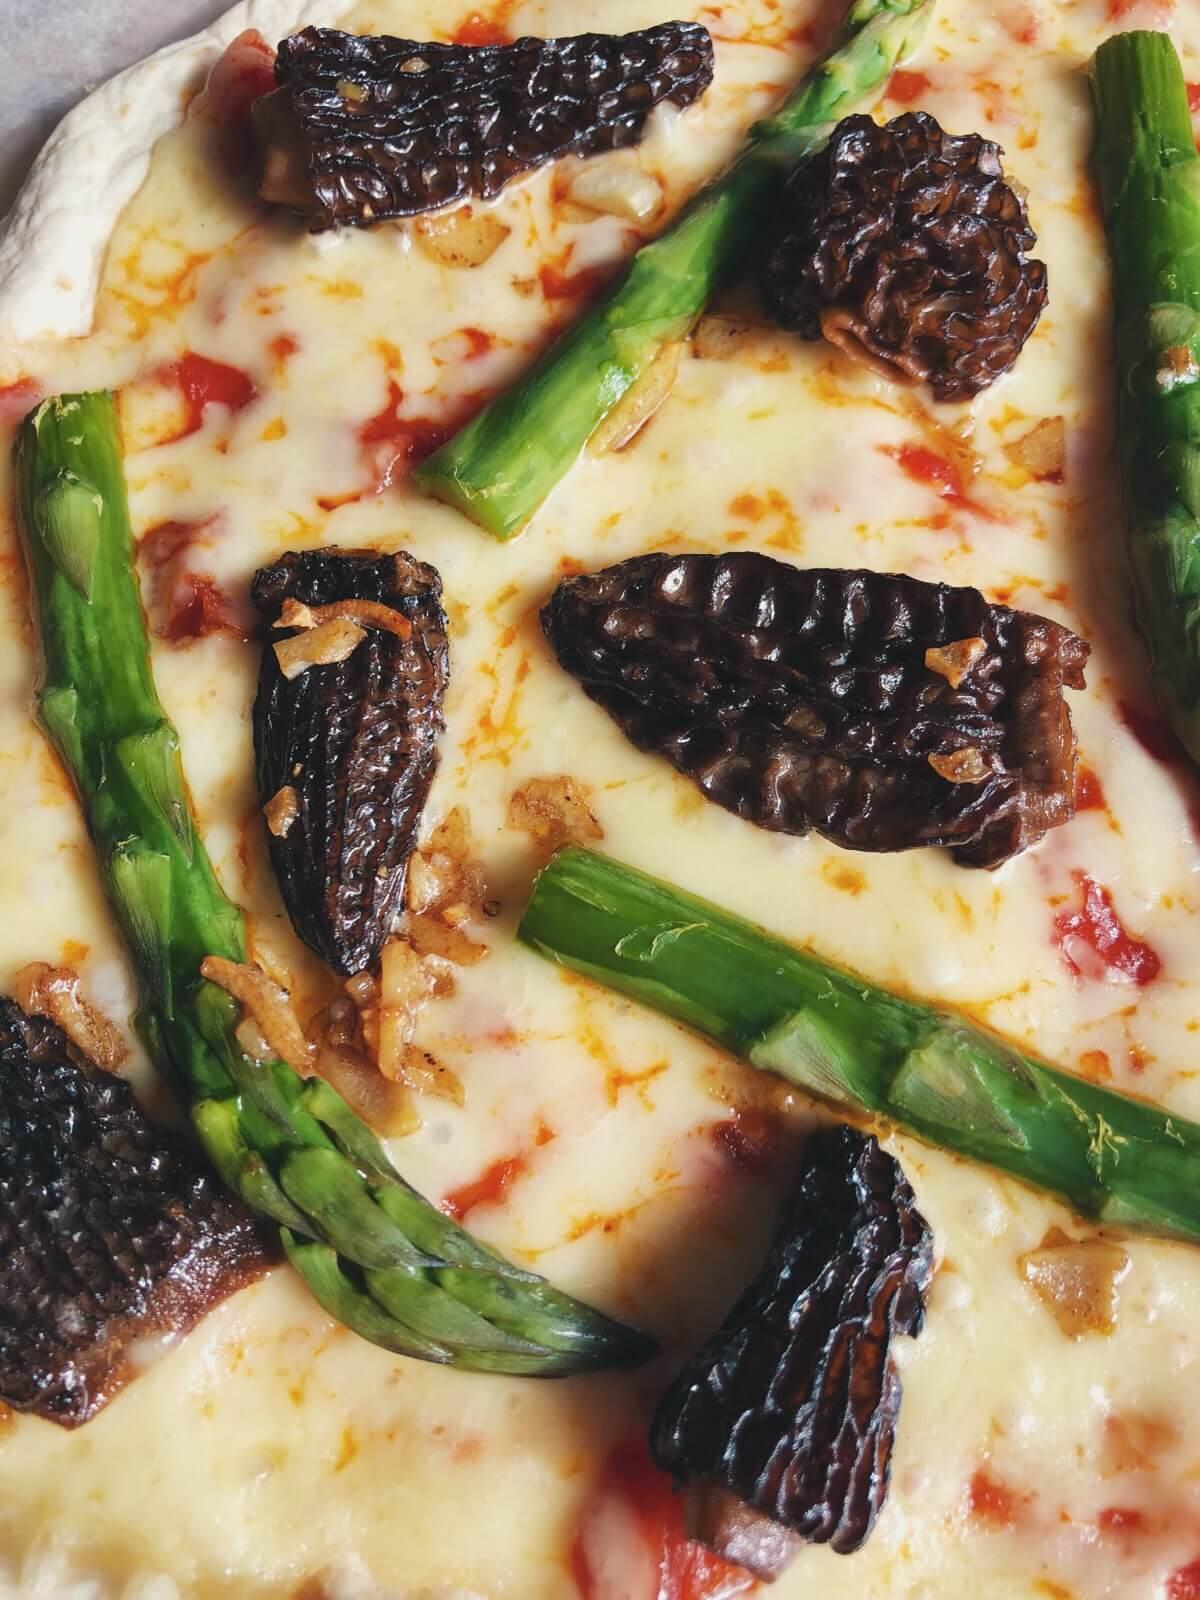 tortilla pizza med morkler ingredienser